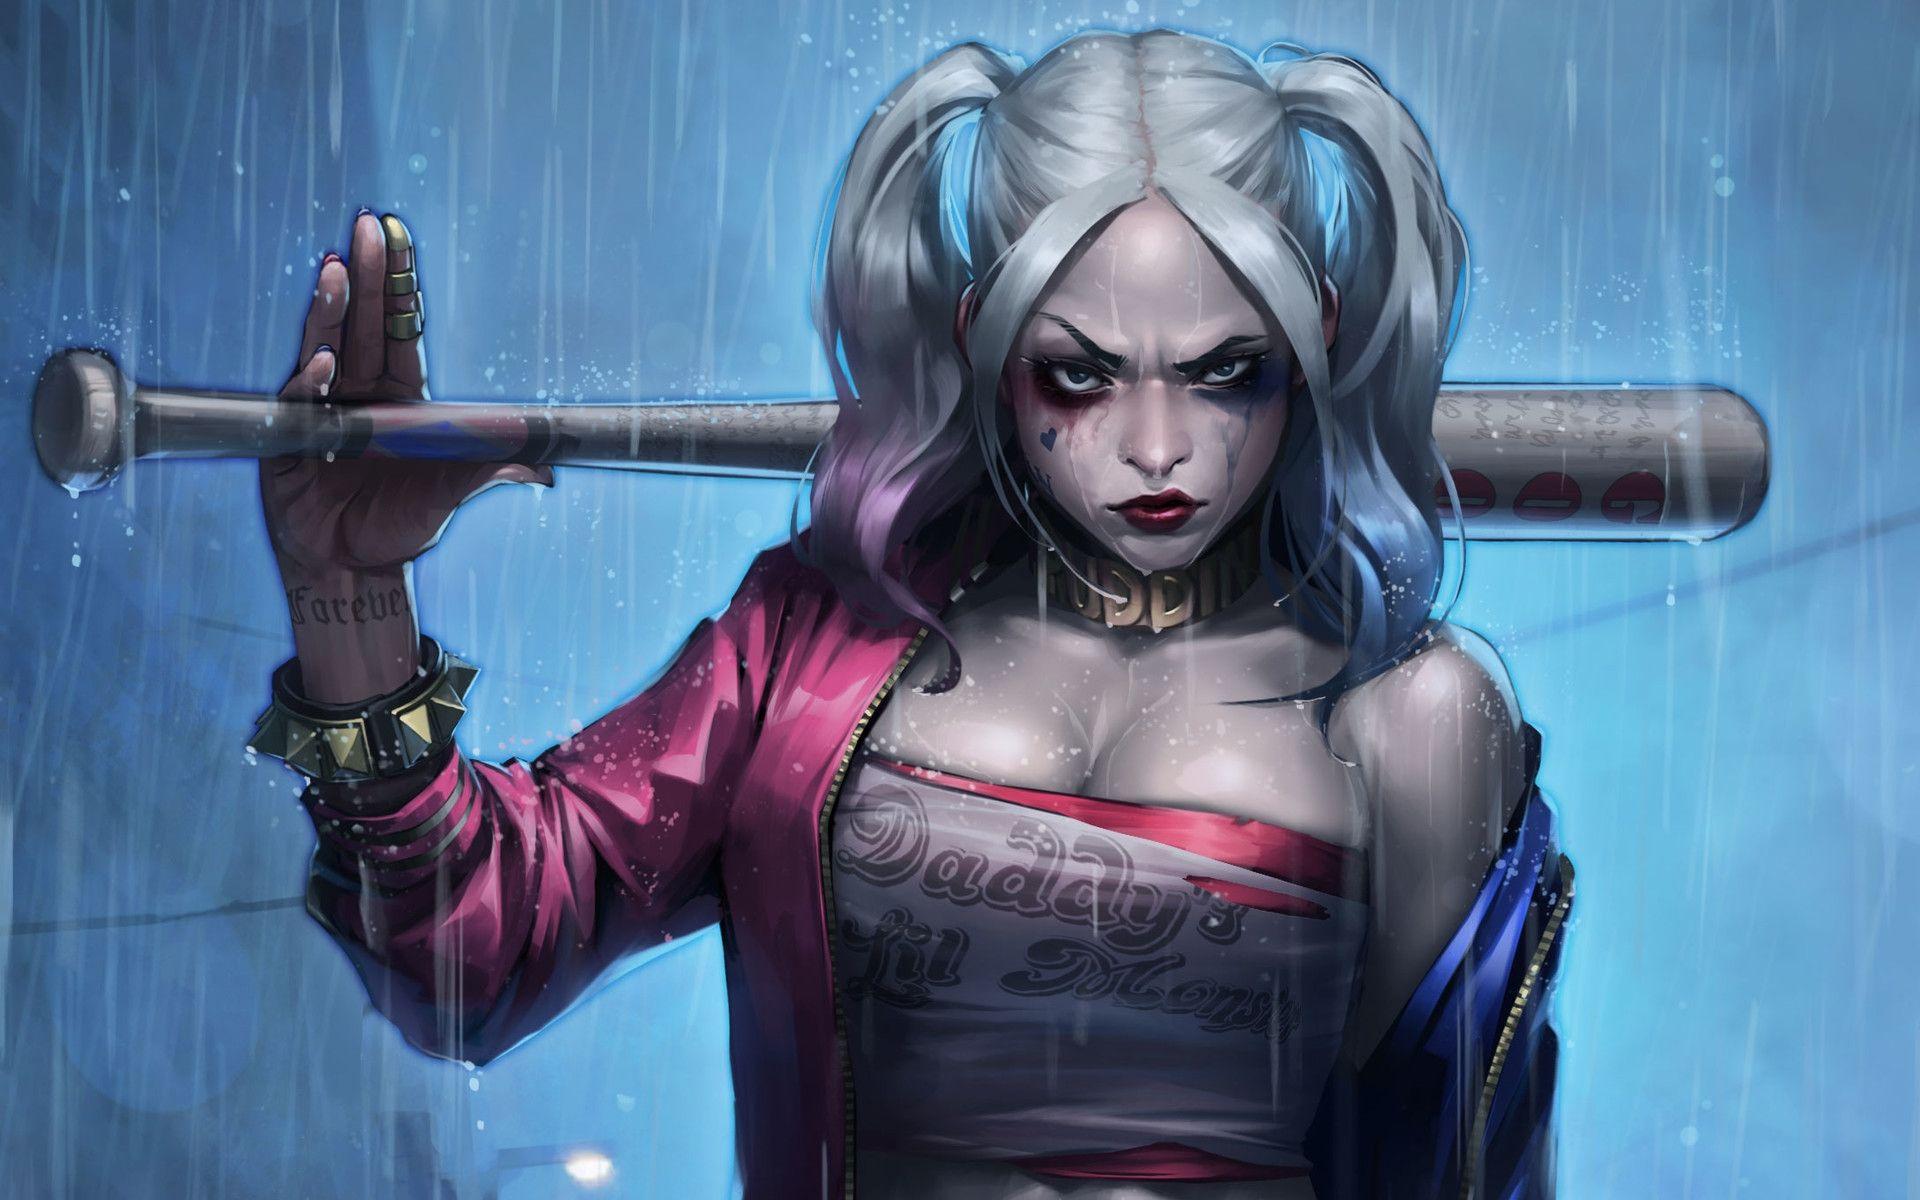 Suicide Squad Harley Quinn art, Wallpaper Theme